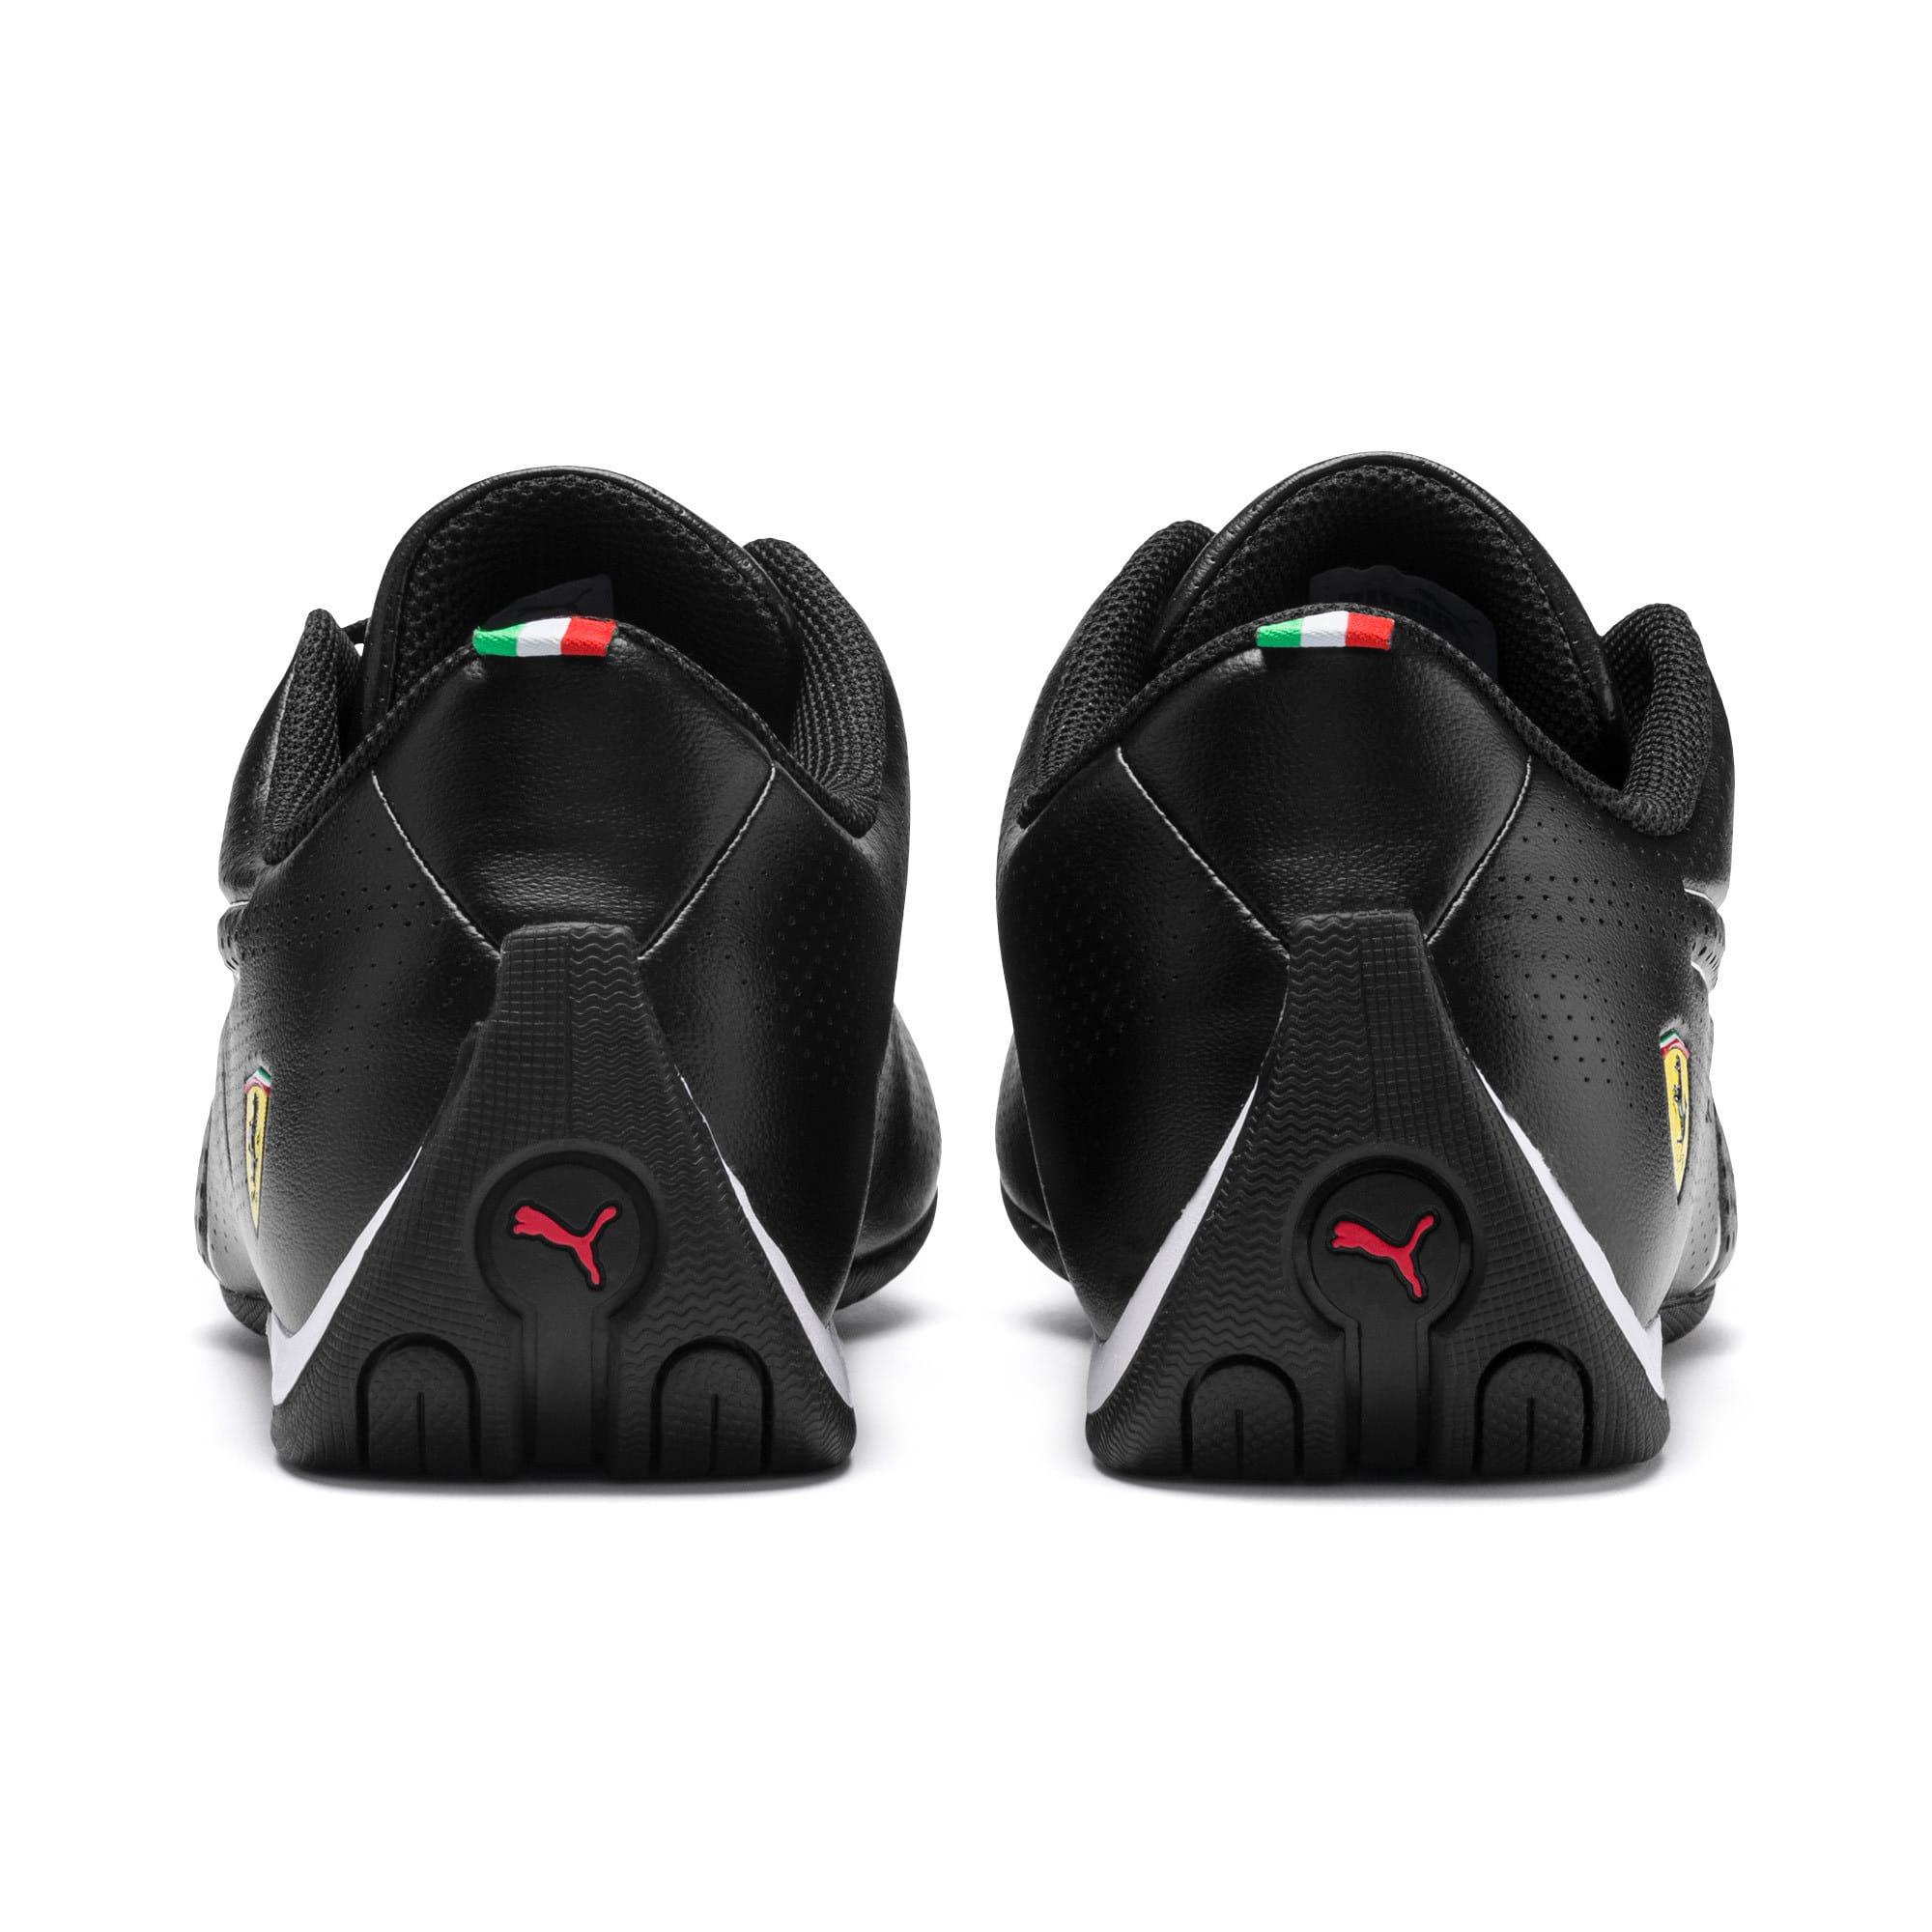 Thumbnail 3 of フェラーリ フューチャーキャット ウルトラ, Puma Black-Puma White, medium-JPN